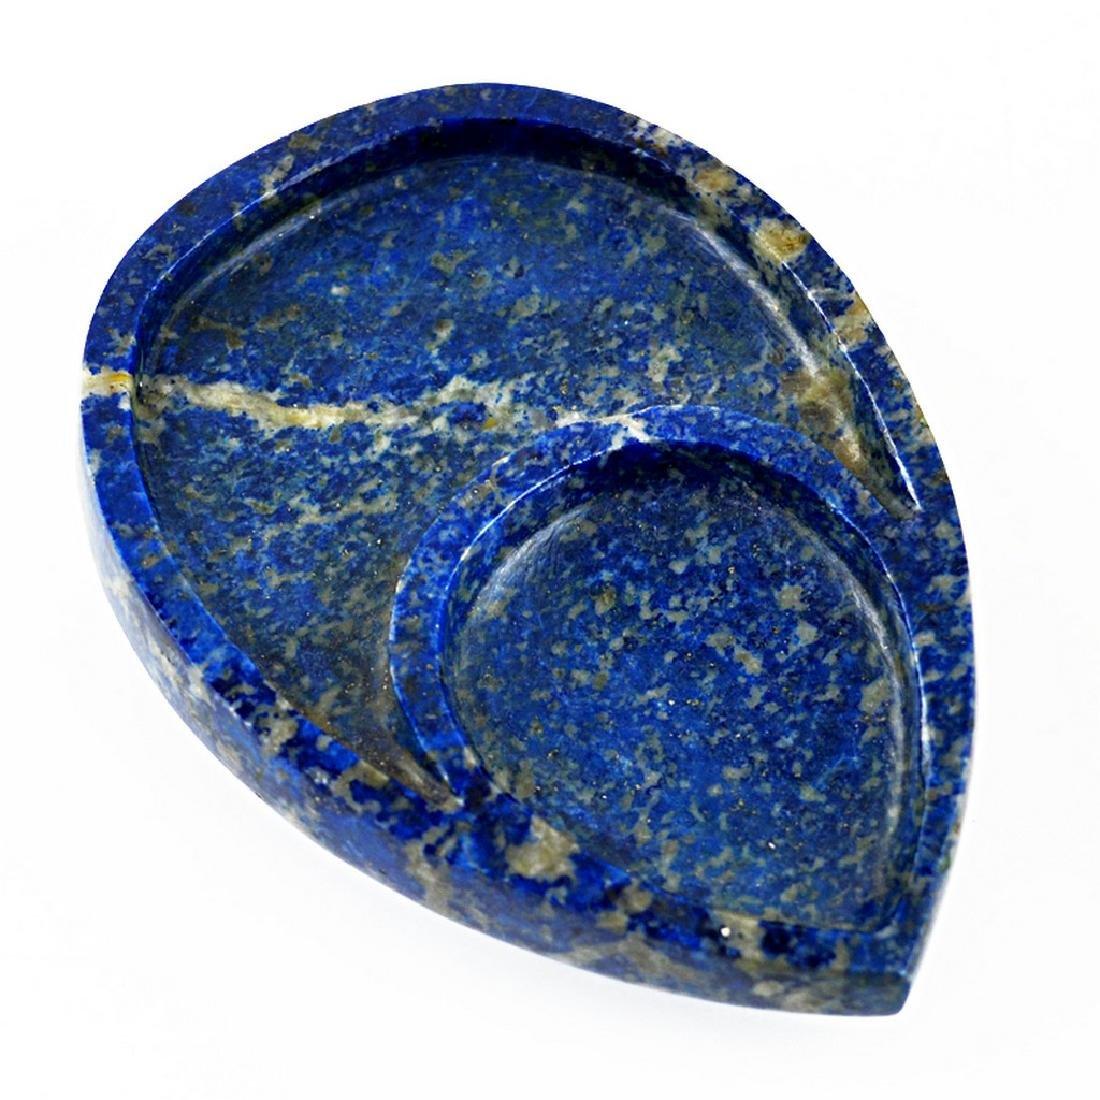 Unique Lapis Lazuli Candle Stand - 4